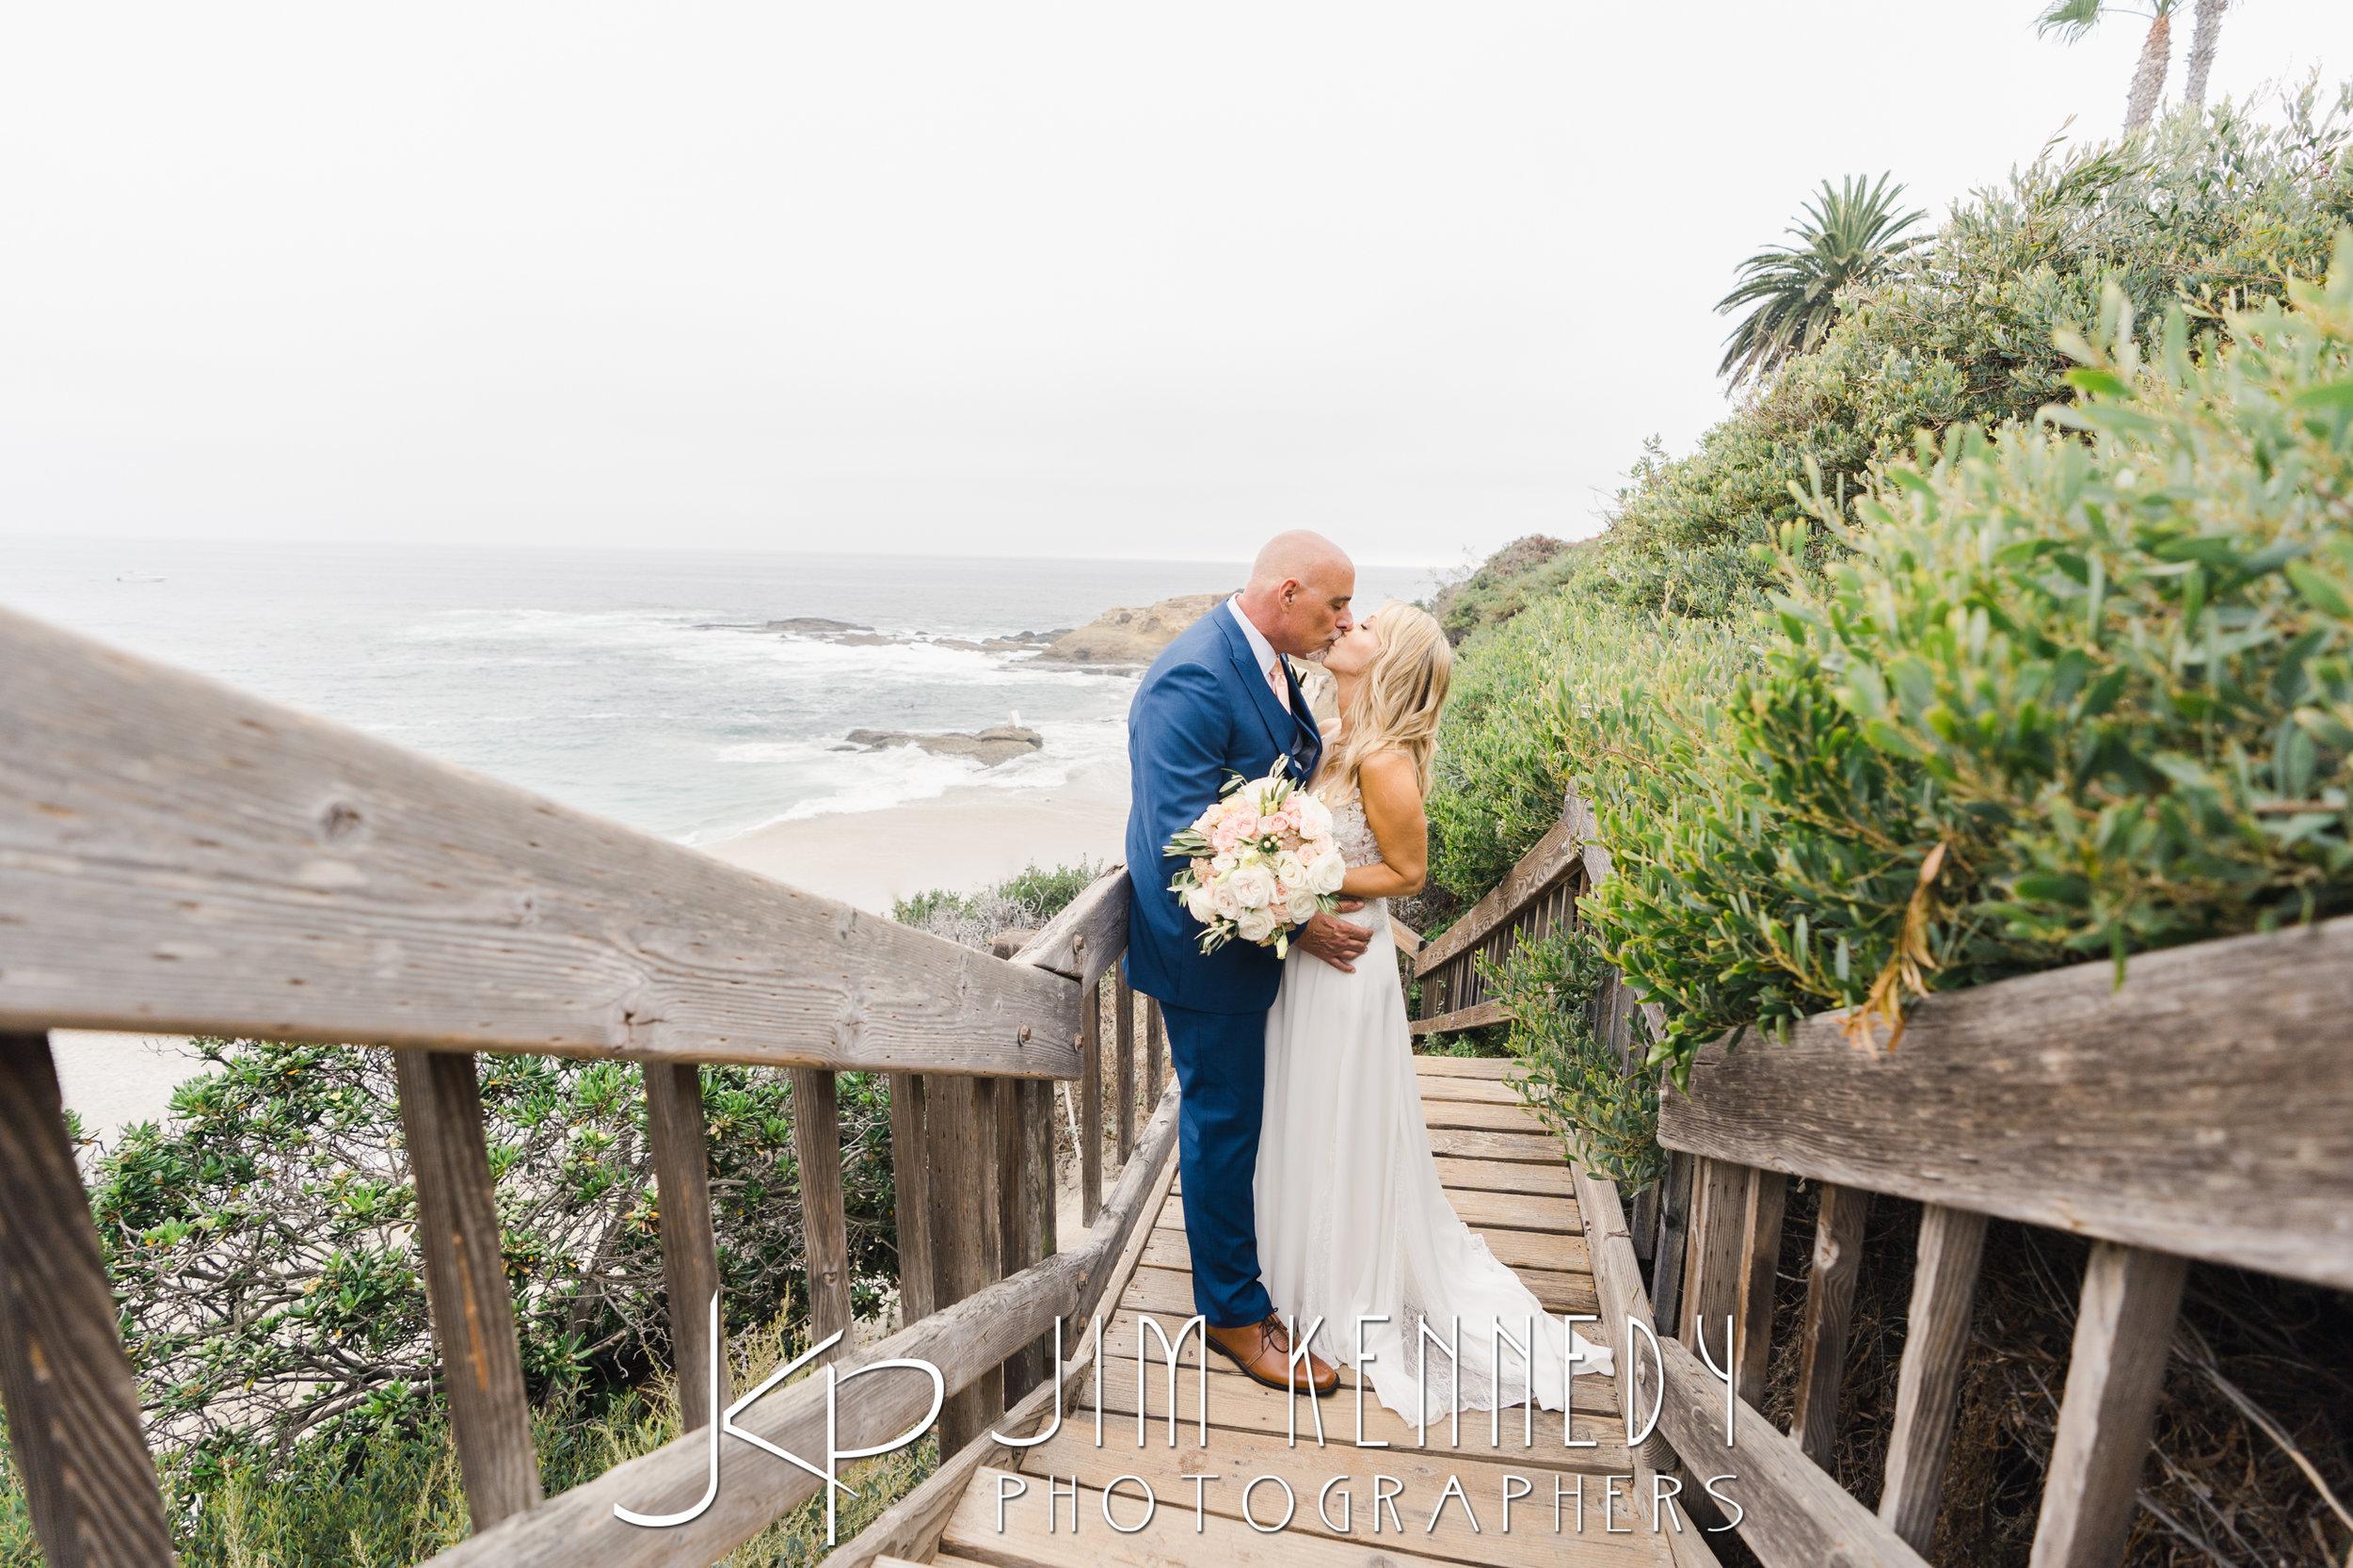 montage-laguna-beach-wedding-josette-nick_0159.JPG